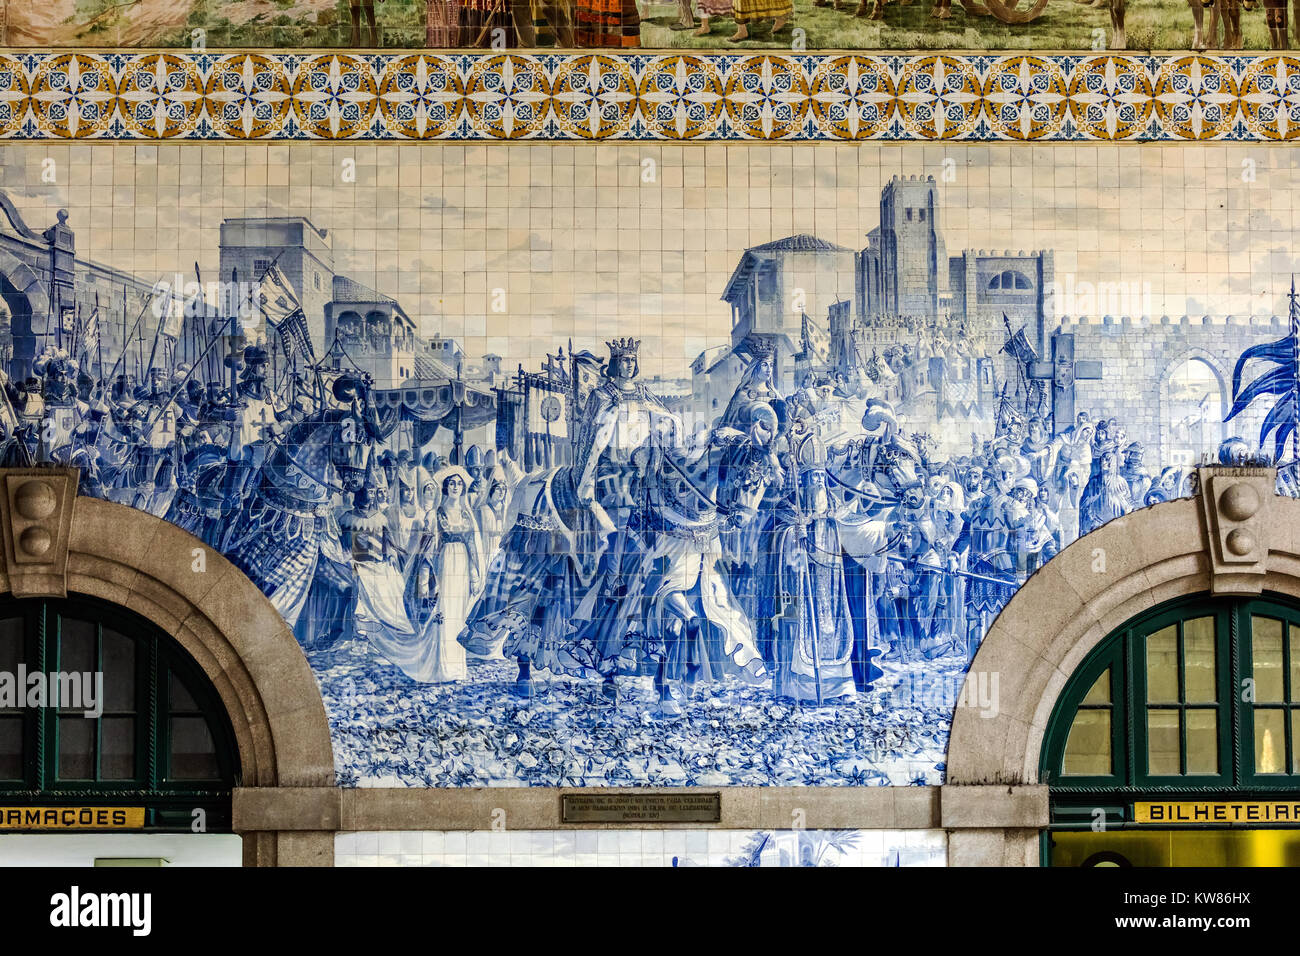 Porto, Portugal, August 15, 2017: Sao Bento railway station's azulejo panel by Jorge Colaco circa 1916, depicting - Stock Image